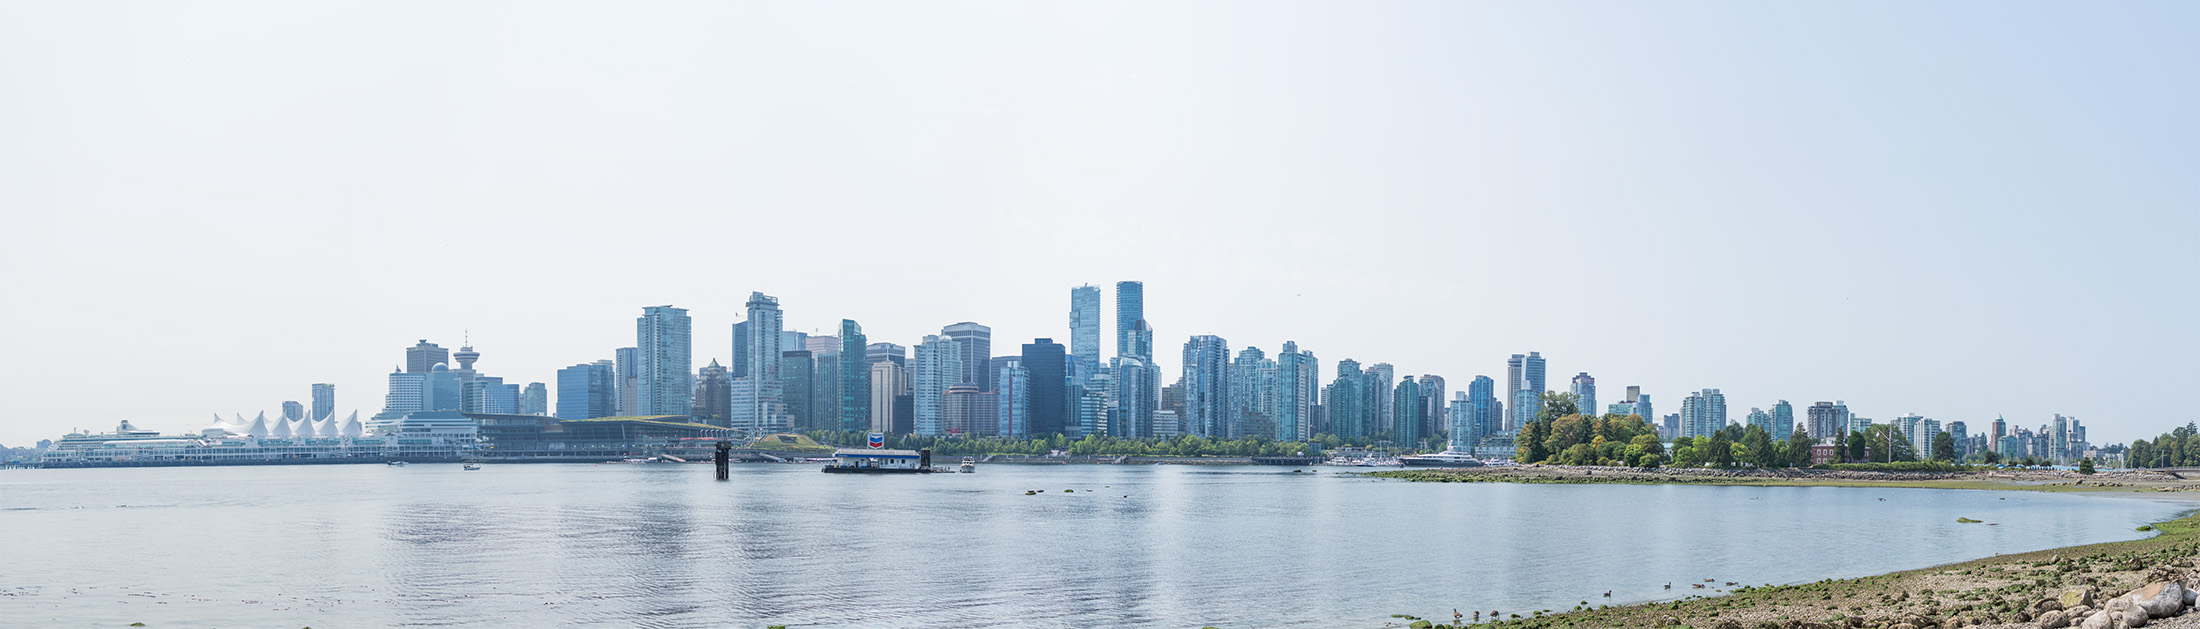 Vancouver horizon - Canada